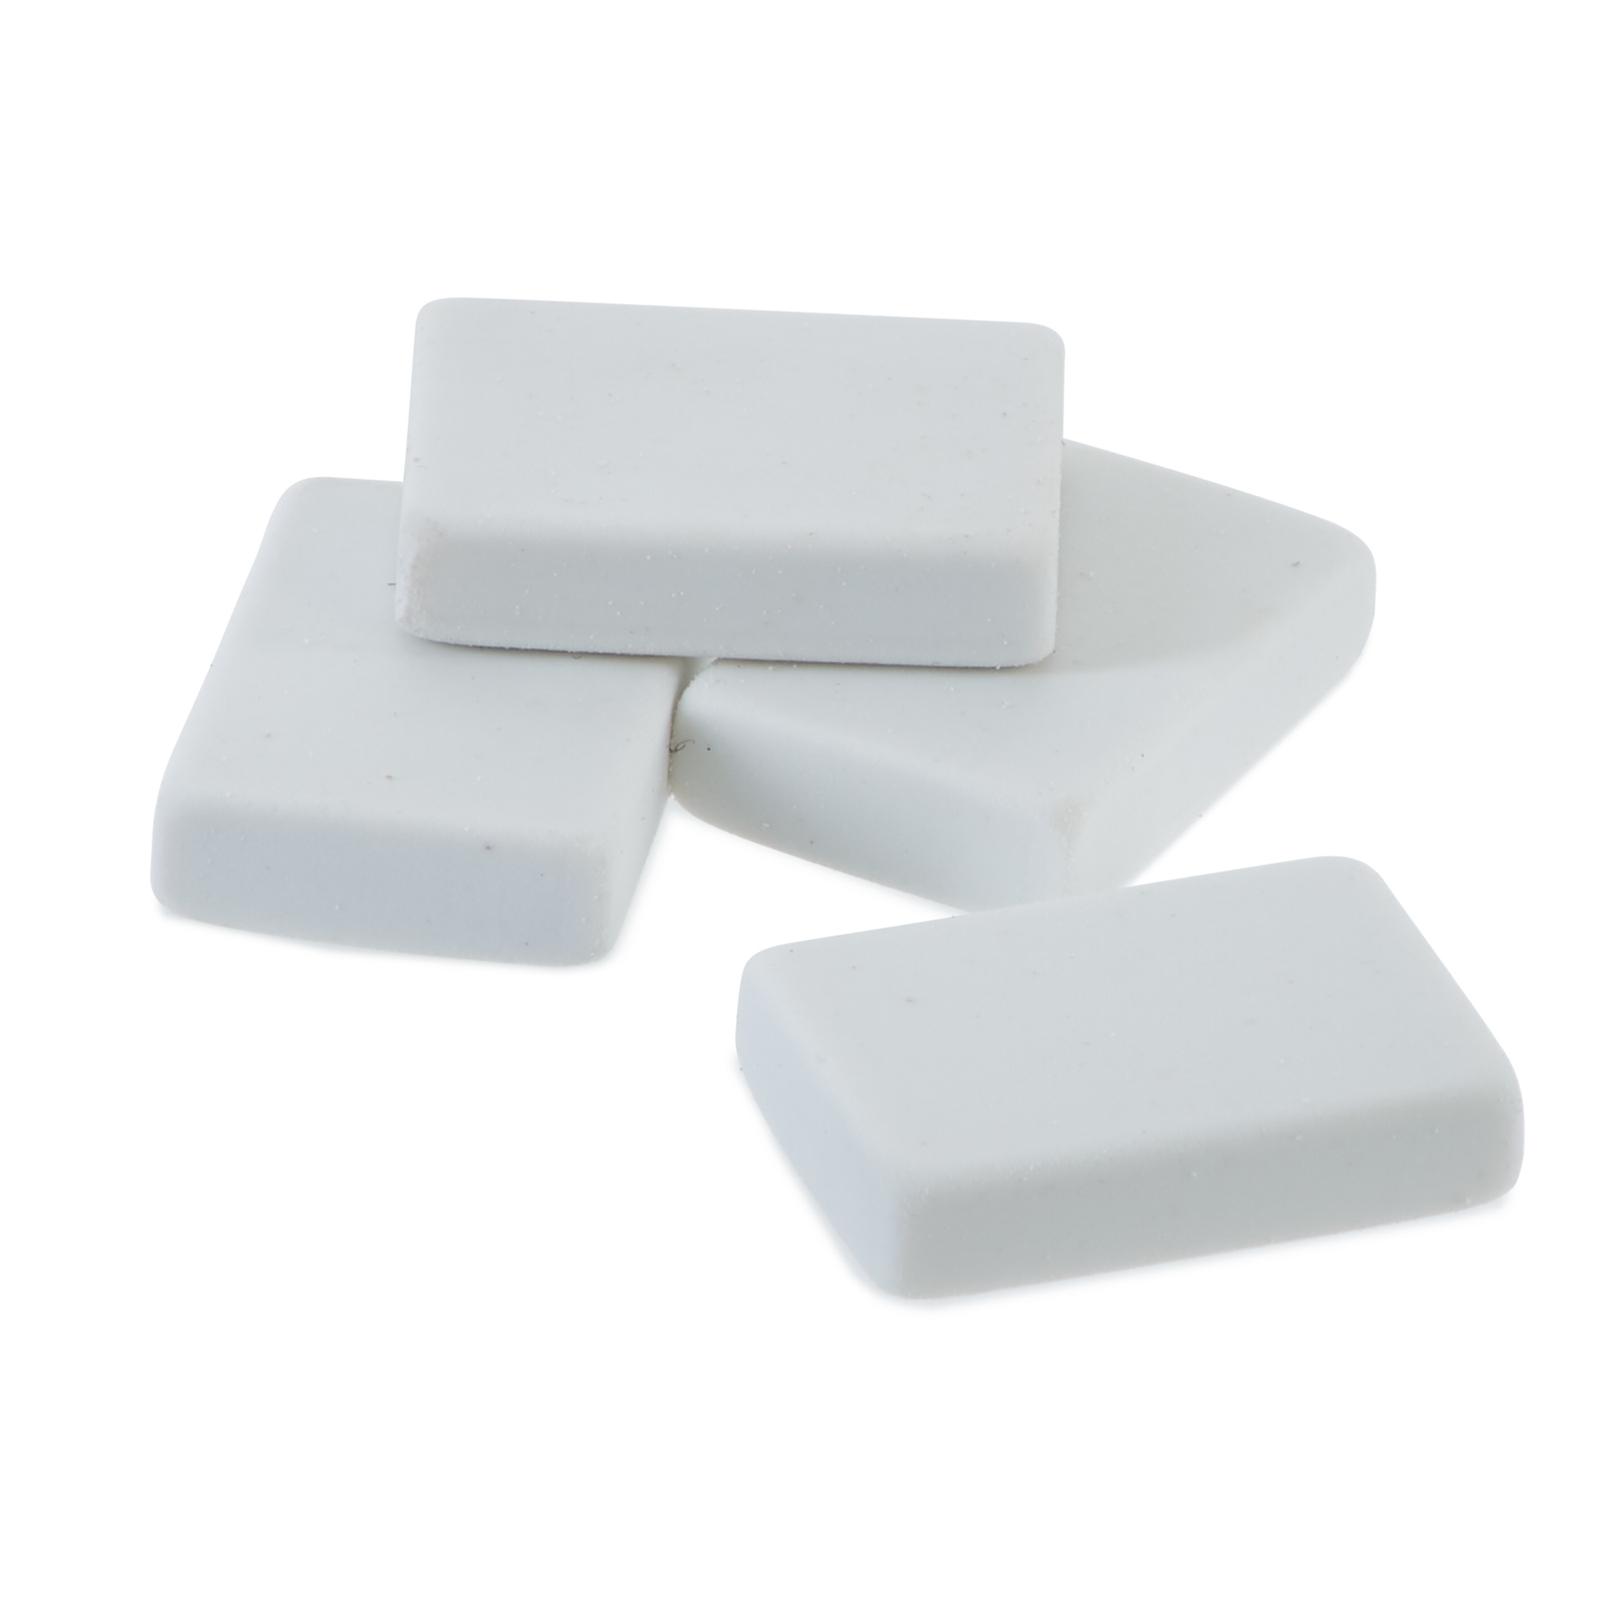 Classmates Eraser Large White - Pack of 24